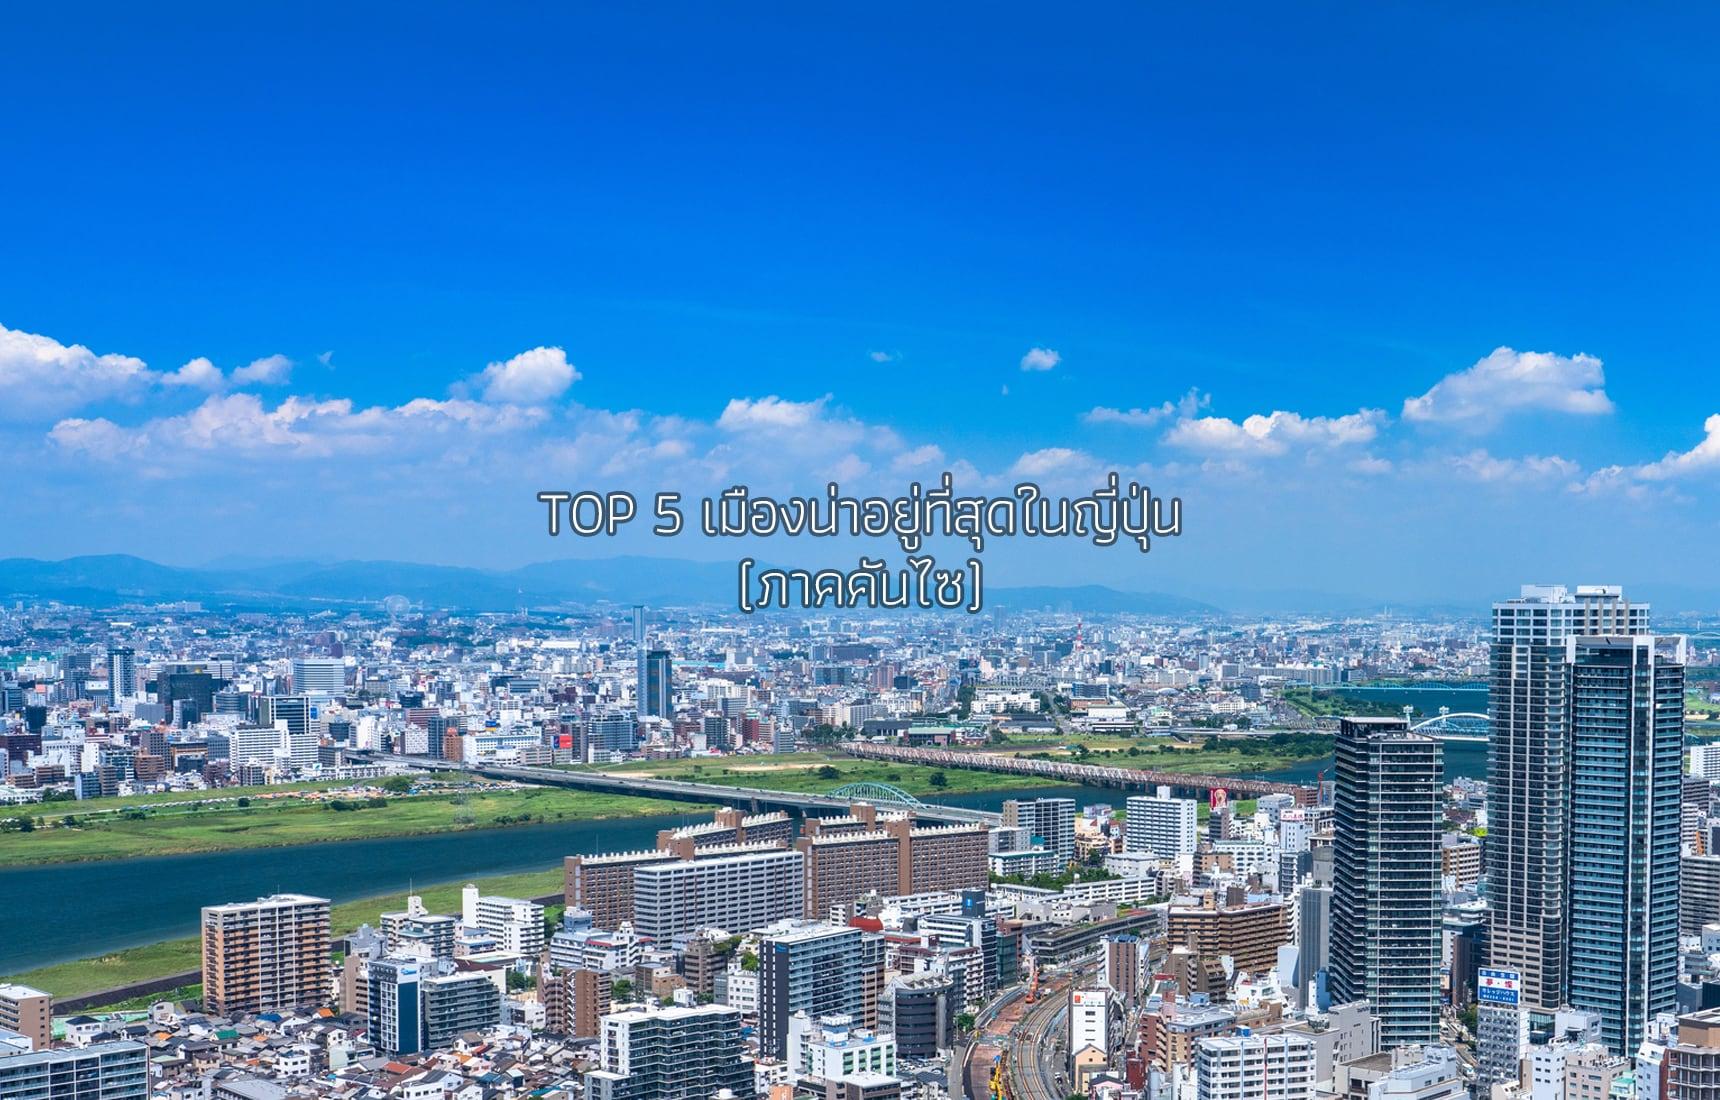 TOP 5 เมืองน่าอยู่ที่สุดในญี่ปุ่น (ภาคคันไซ)